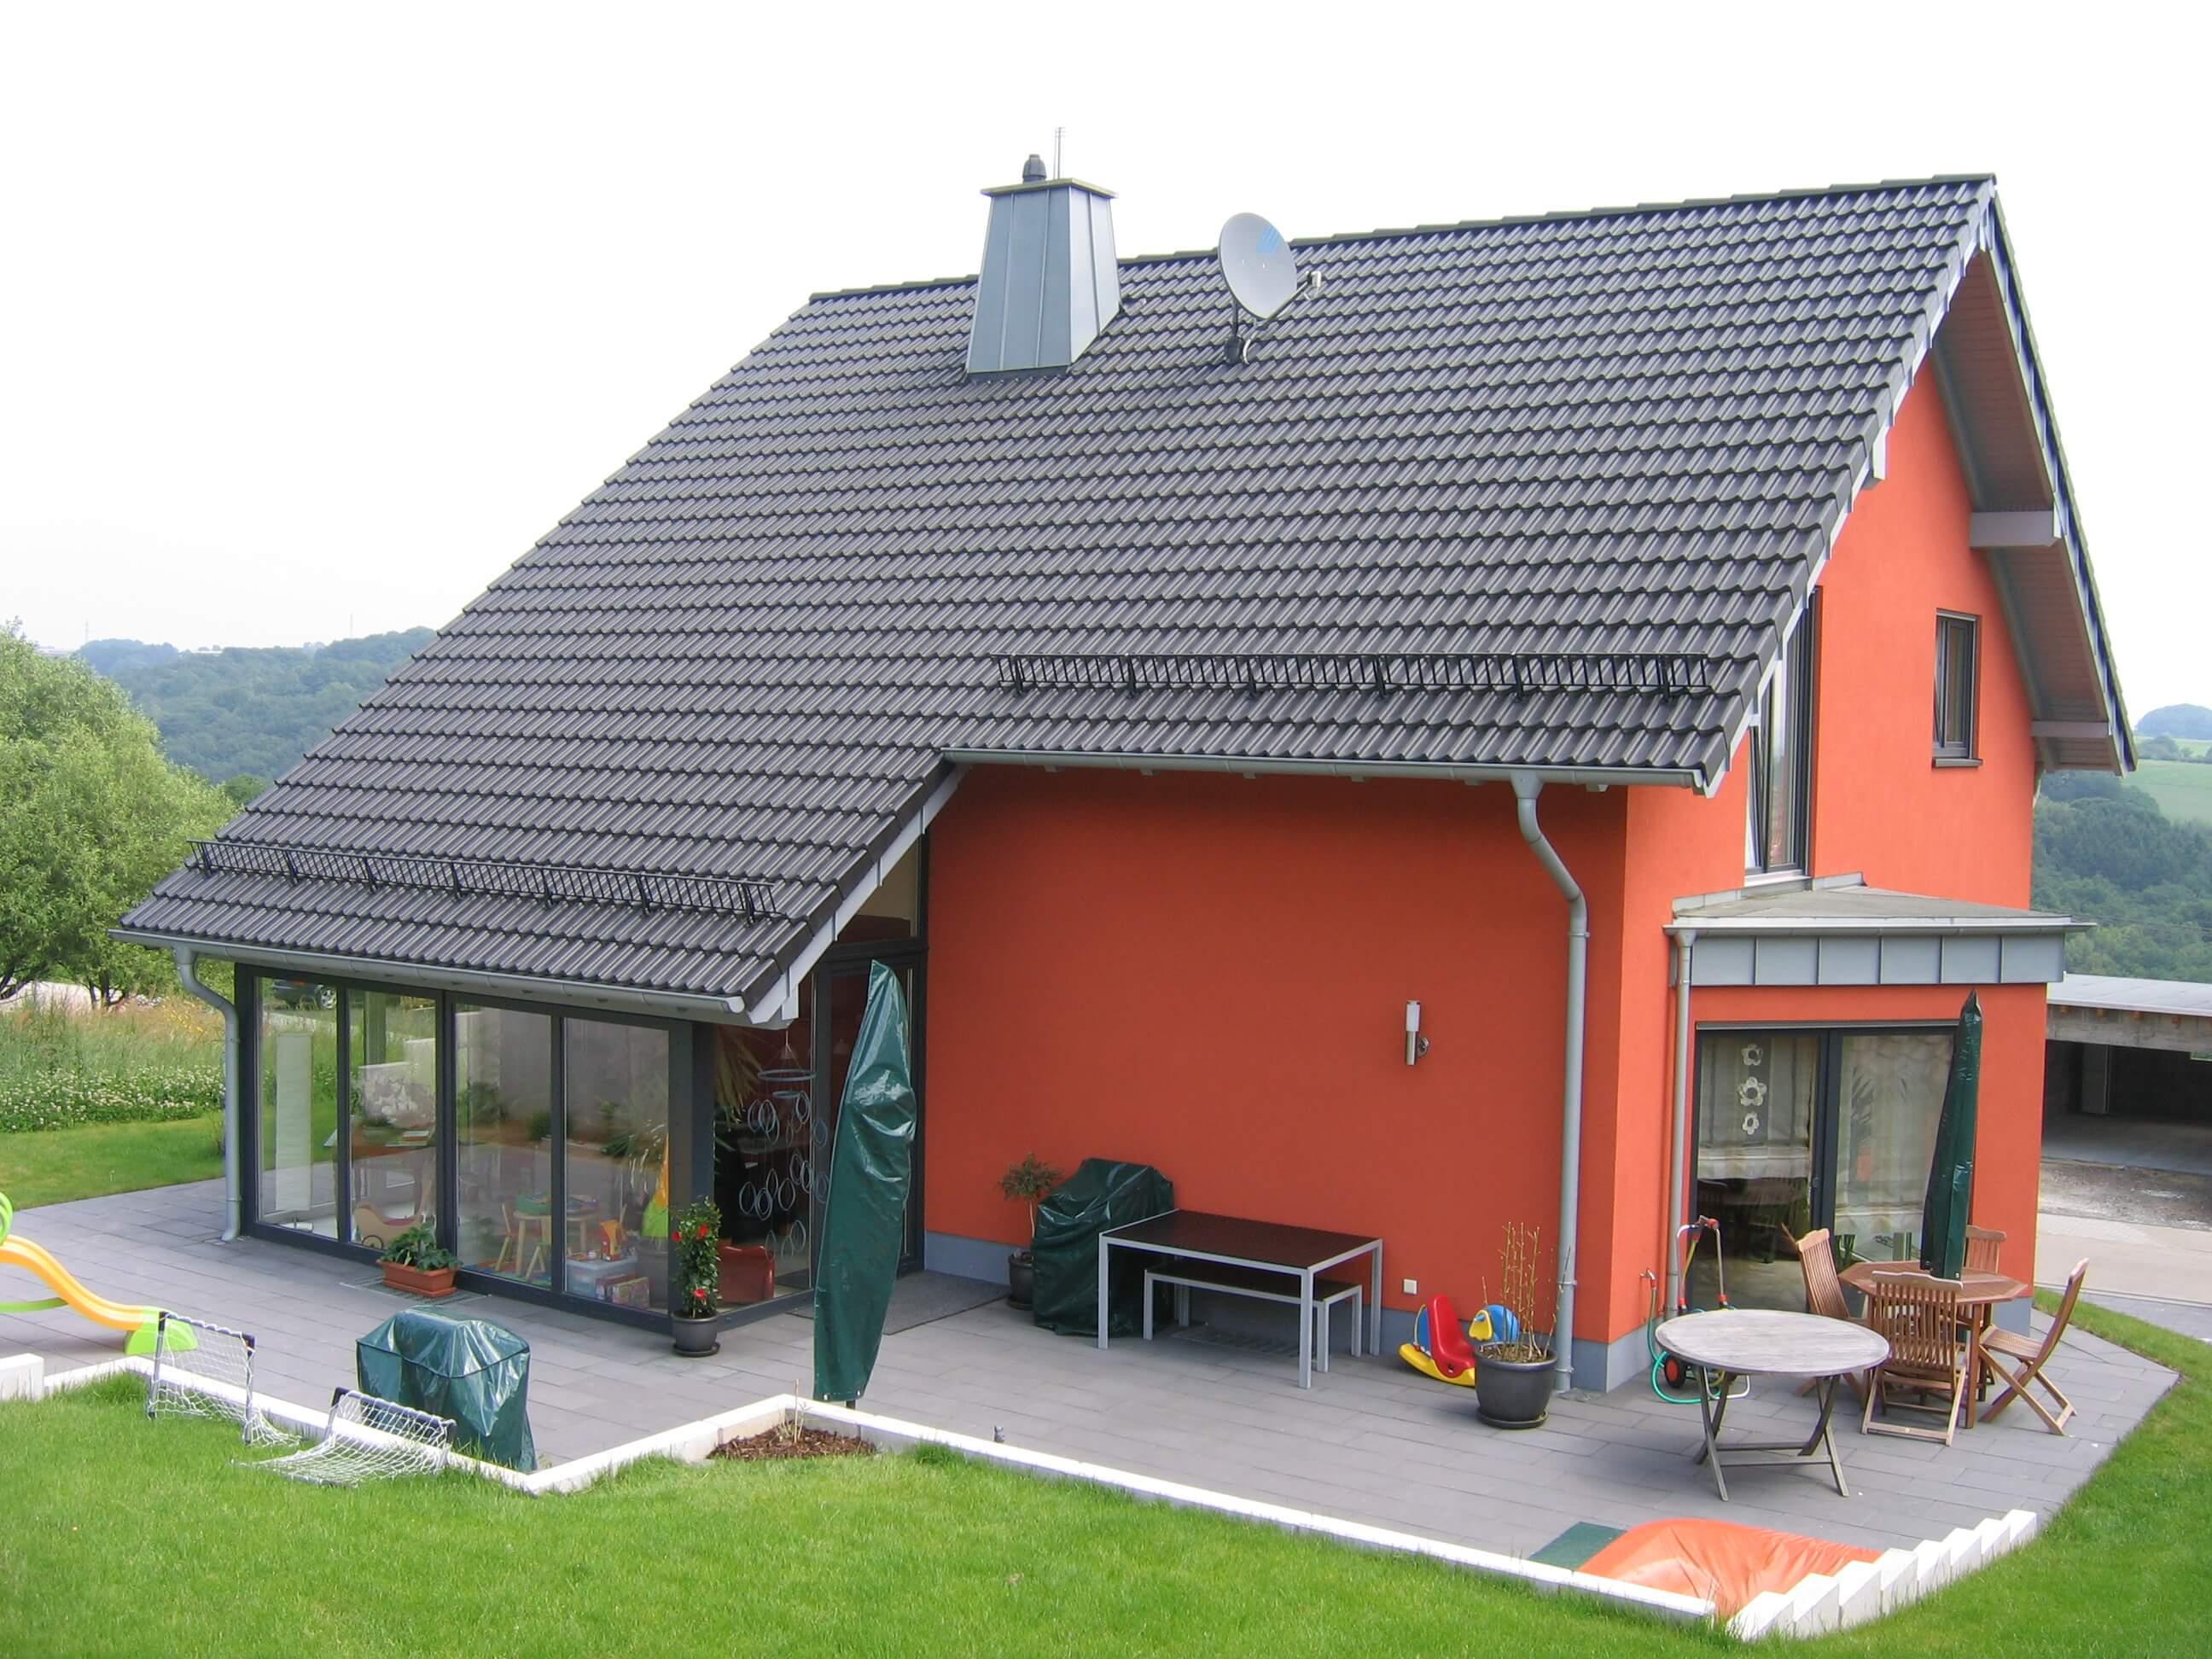 EFH vom Architekten